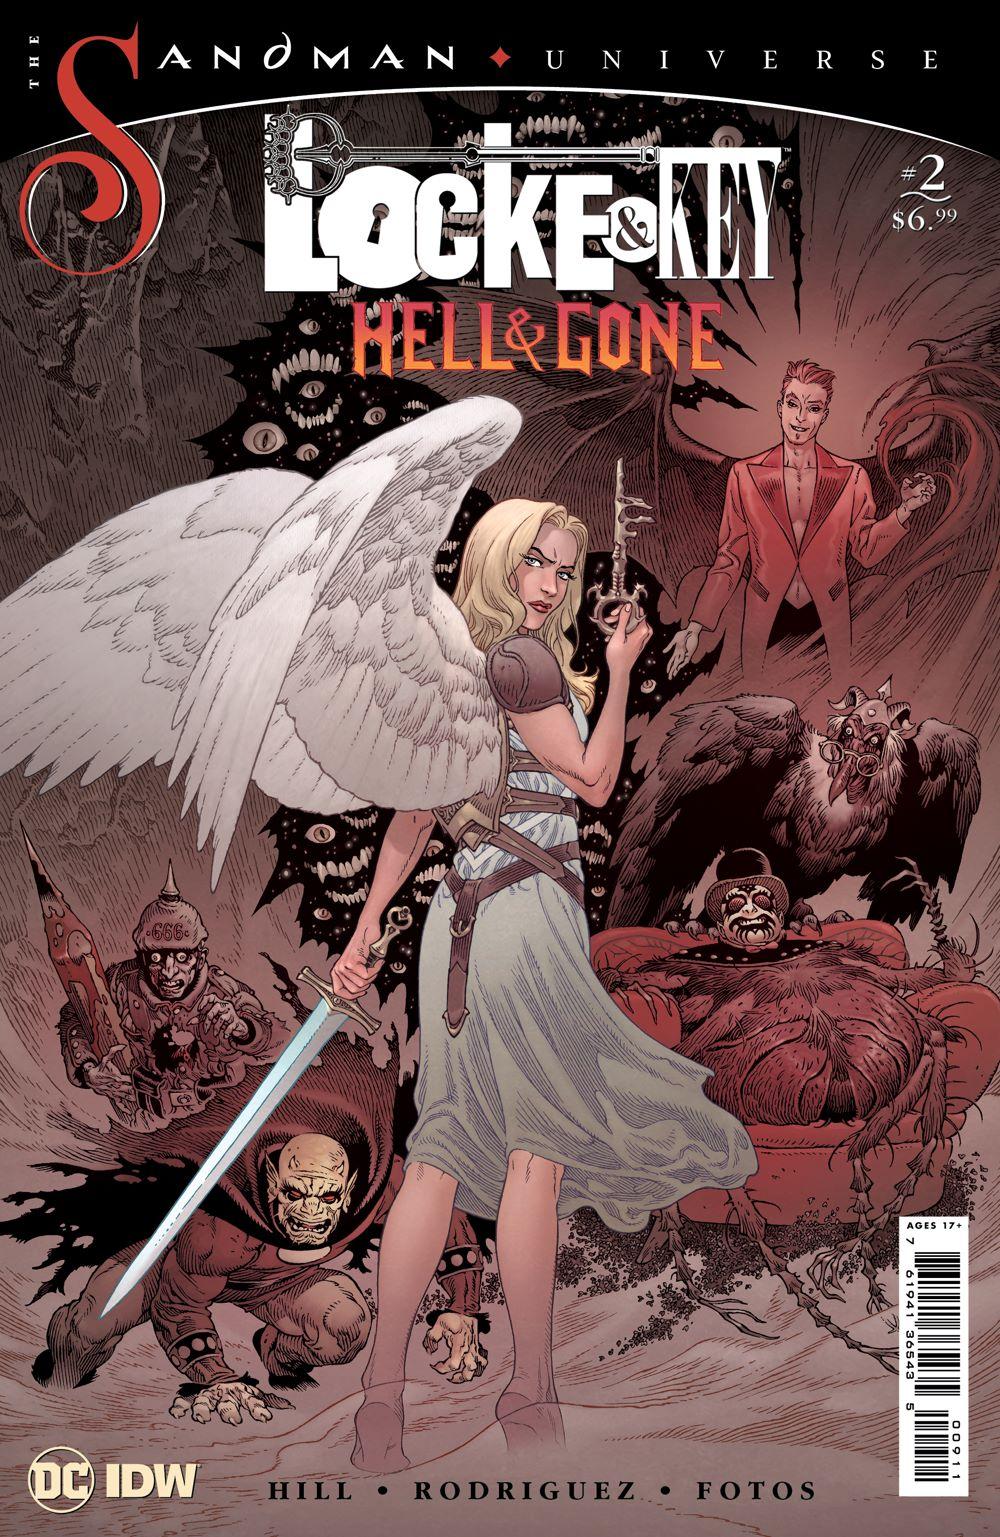 SUNI_LK_HG_Cv1 DC Comics August 2021 Solicitations